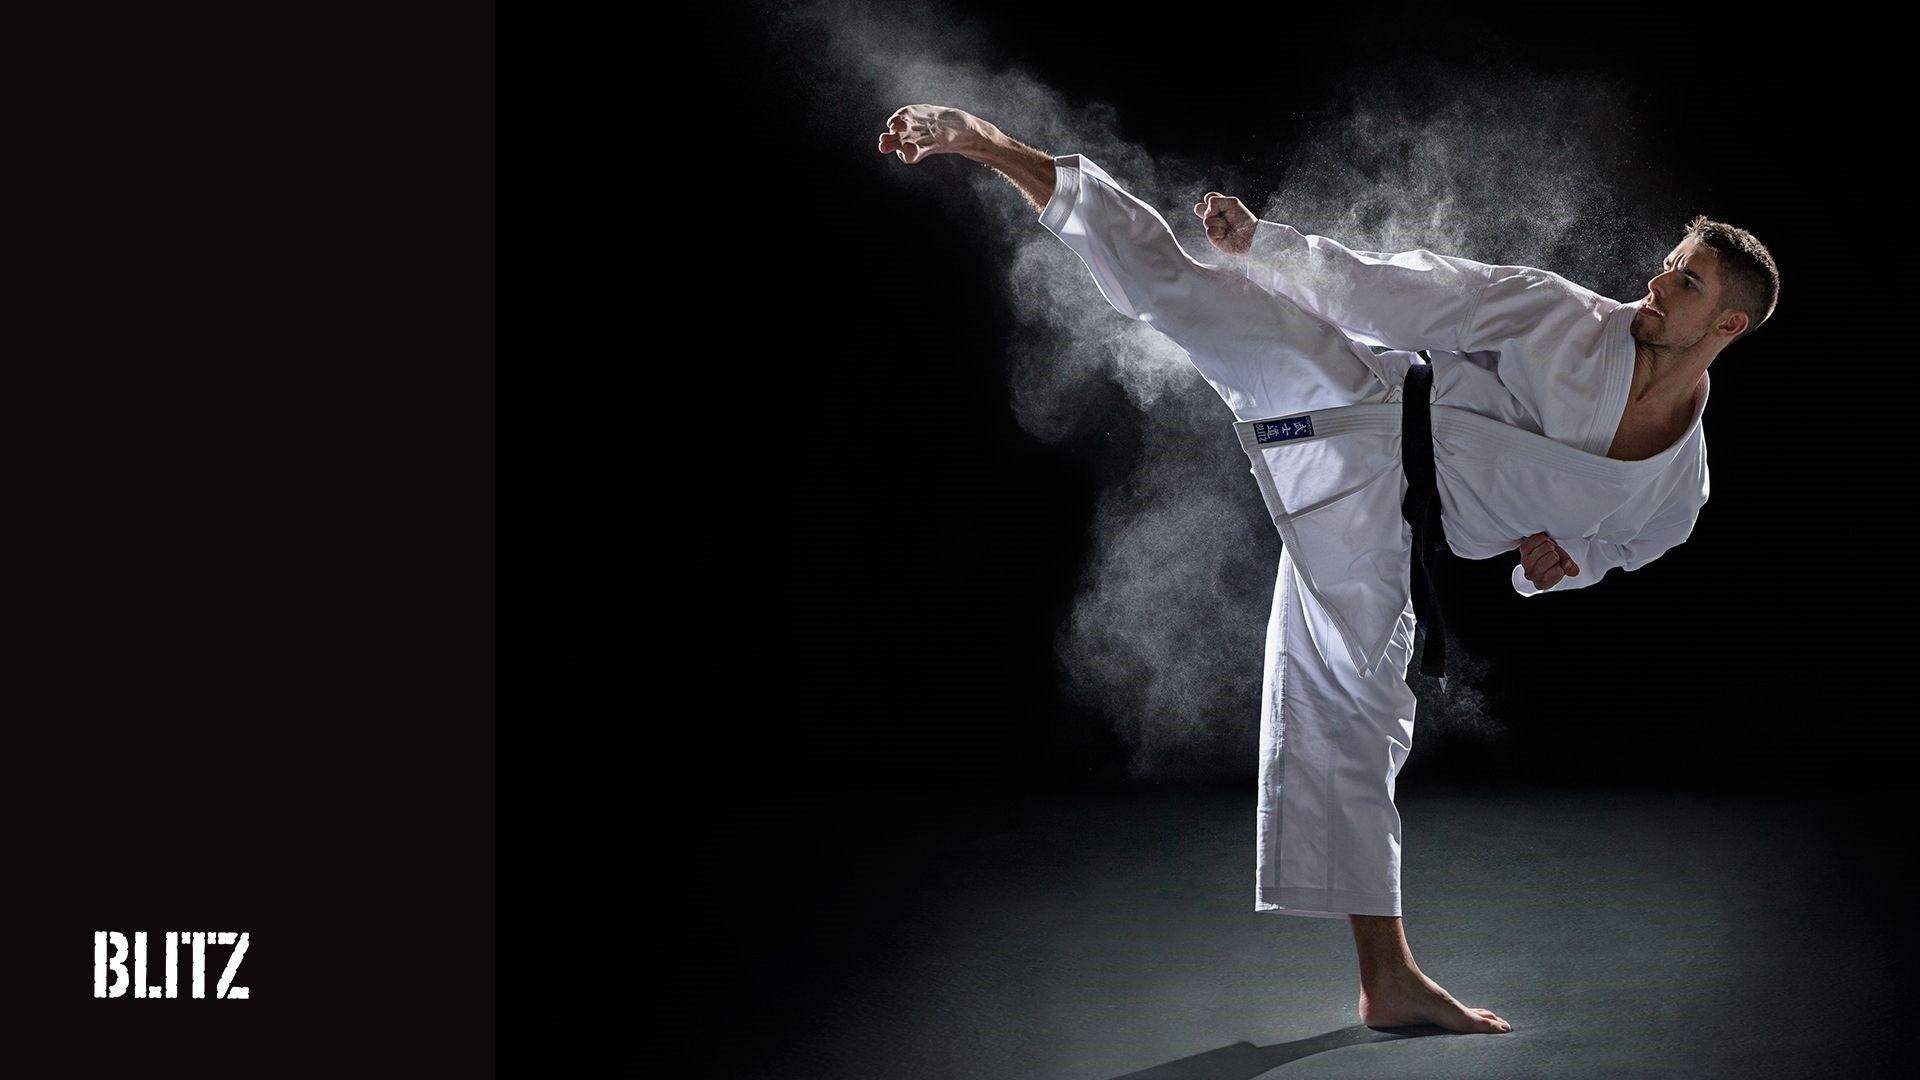 Karate wallpaper image hd